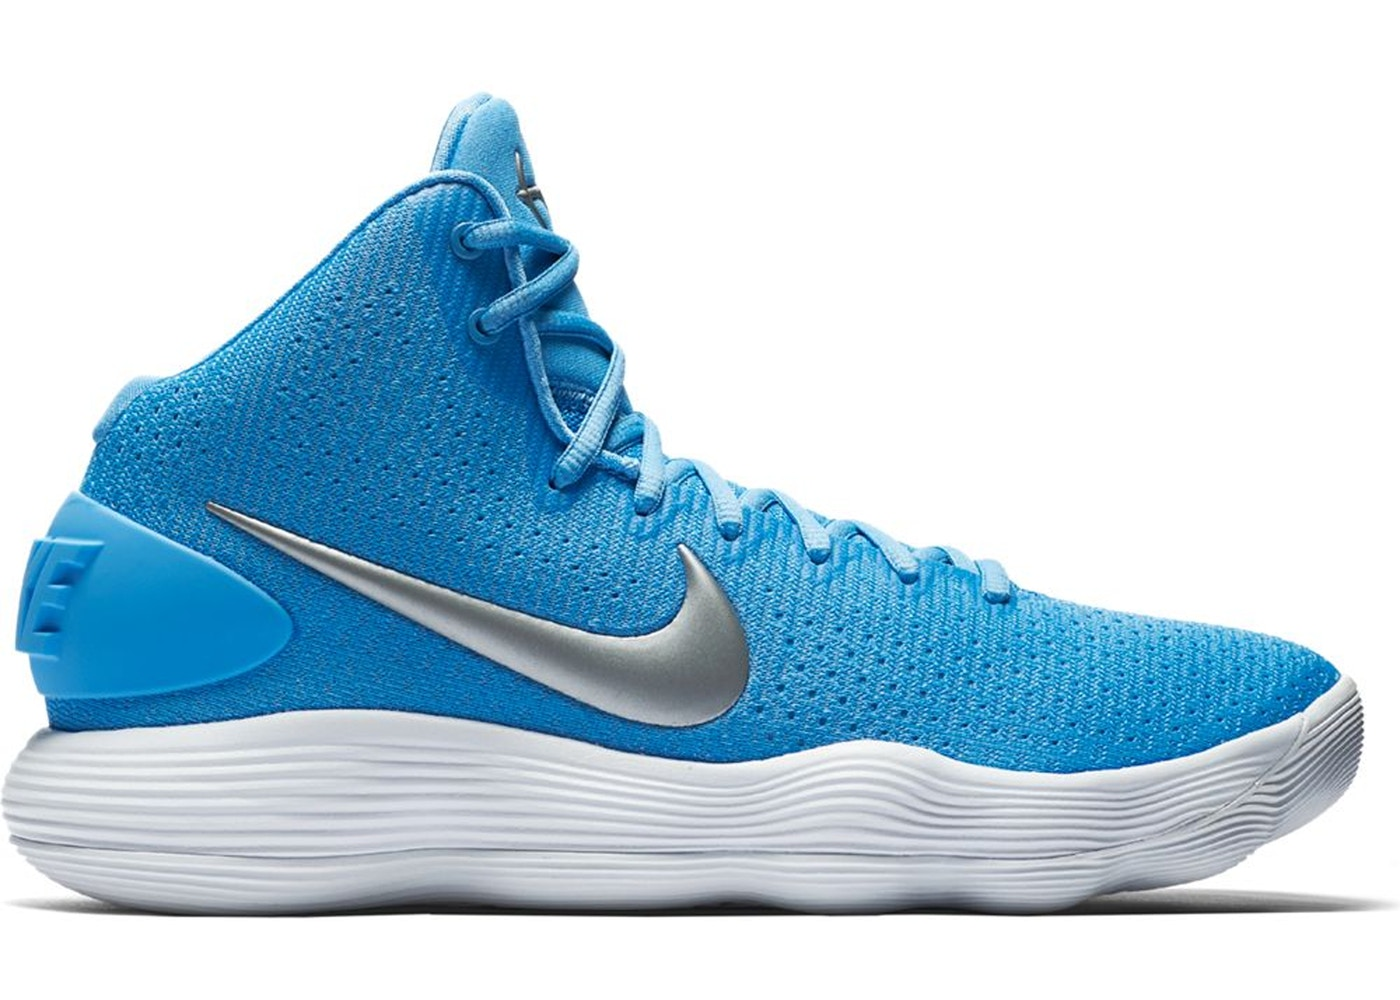 81717deddff5 Sell. or Ask. Size --. View All Bids. Nike Hyperdunk 2017 University Blue